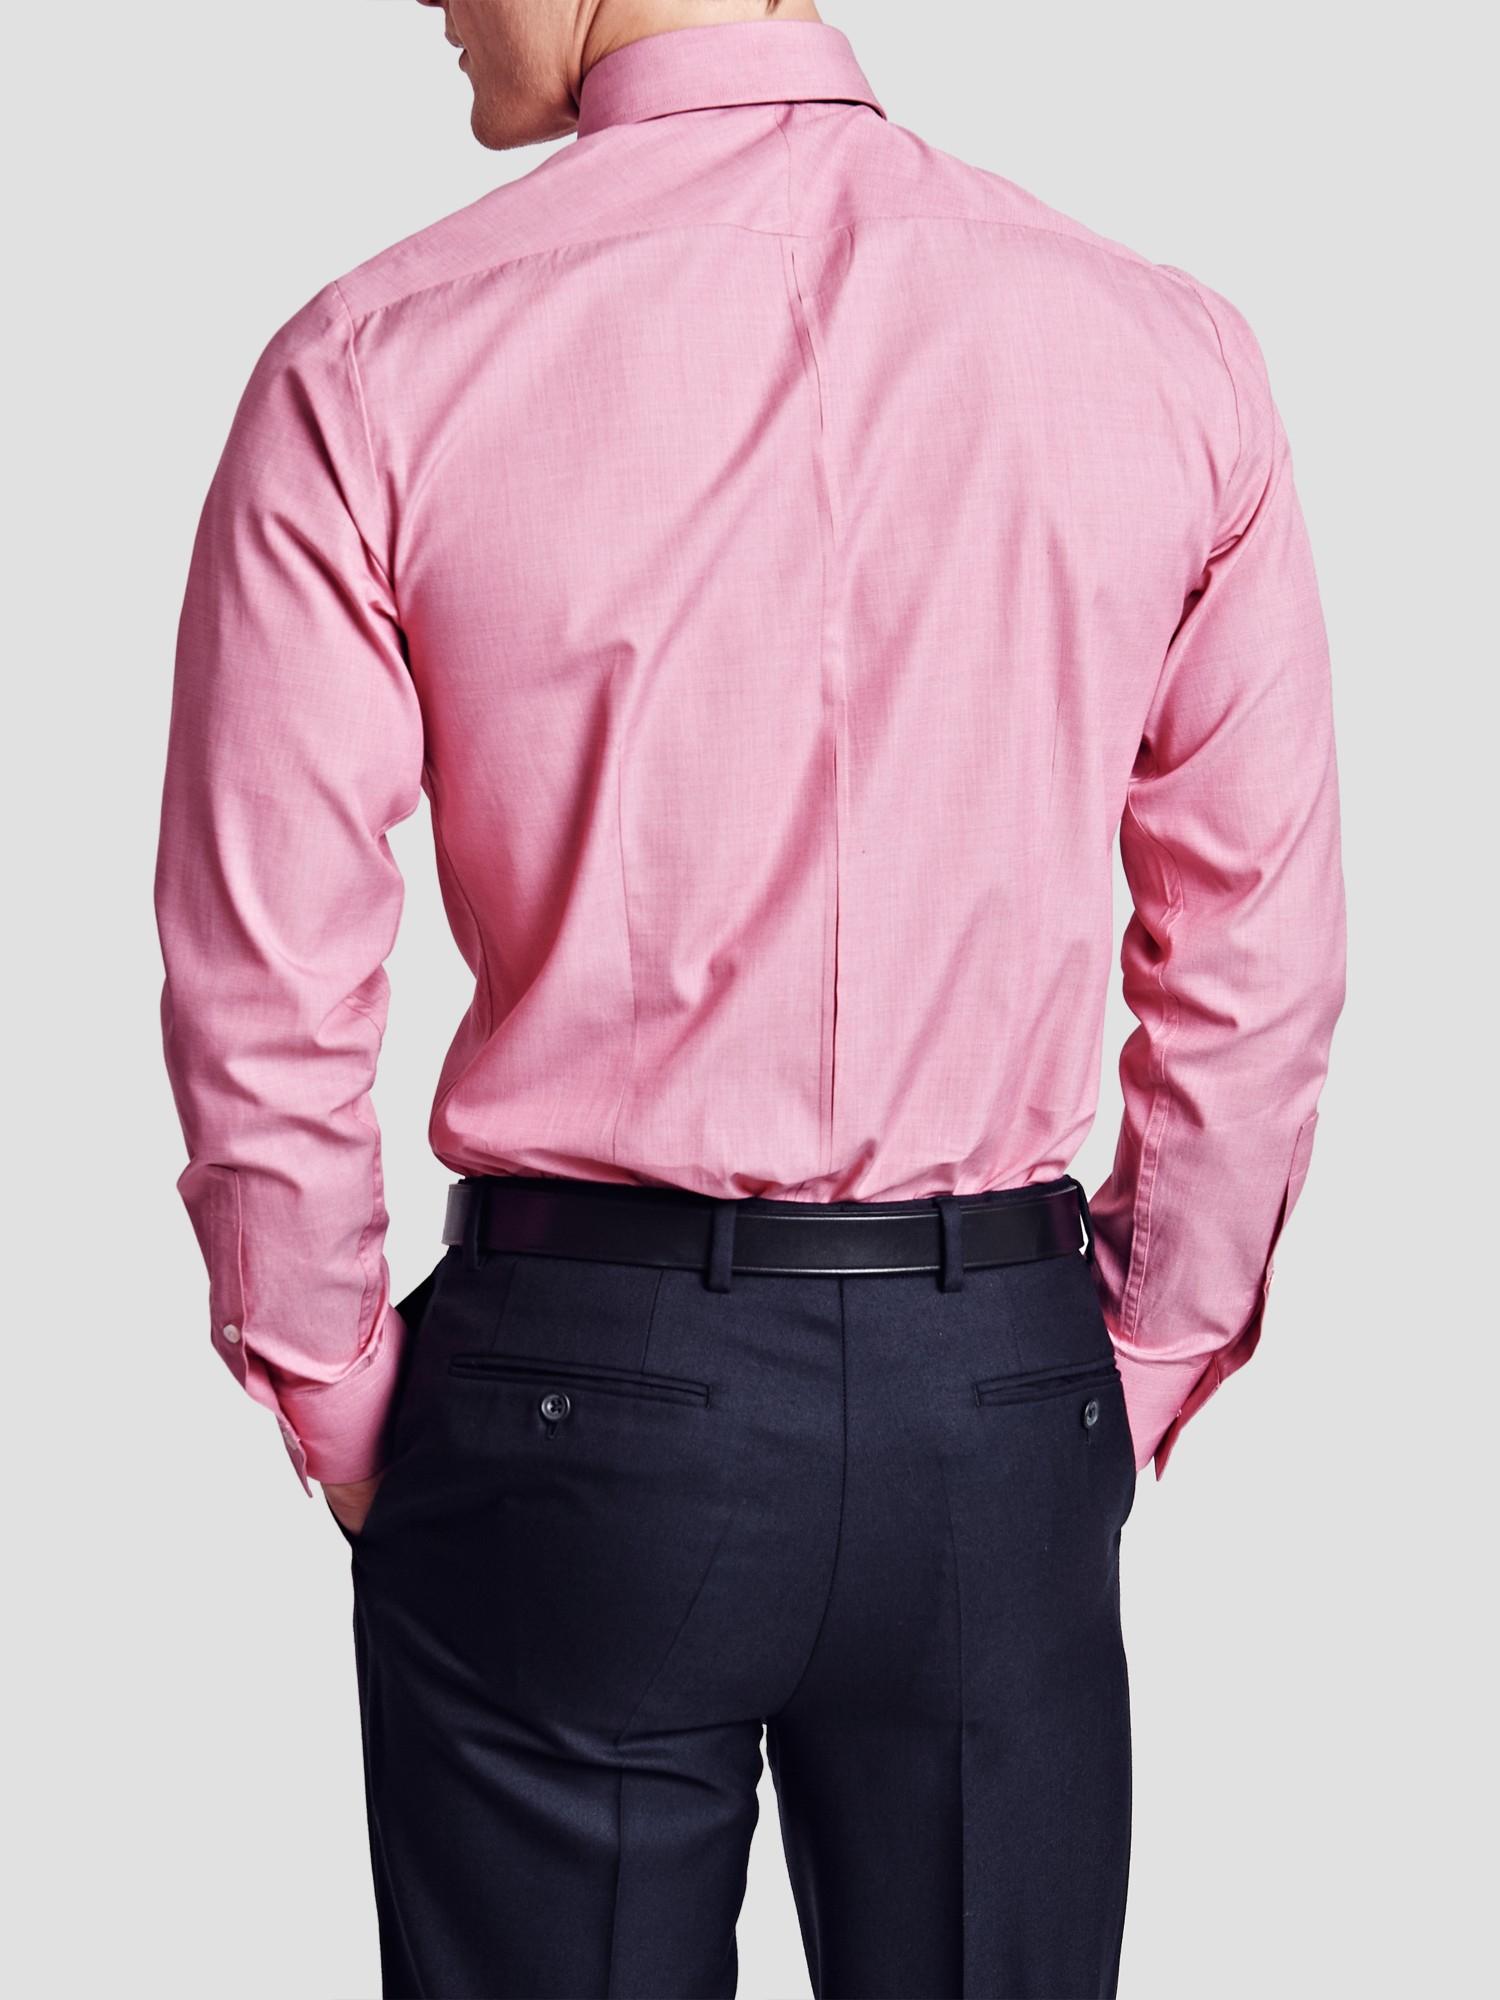 Thomas Pink Derick Plain Super Slim Fit Shirt In Pink For